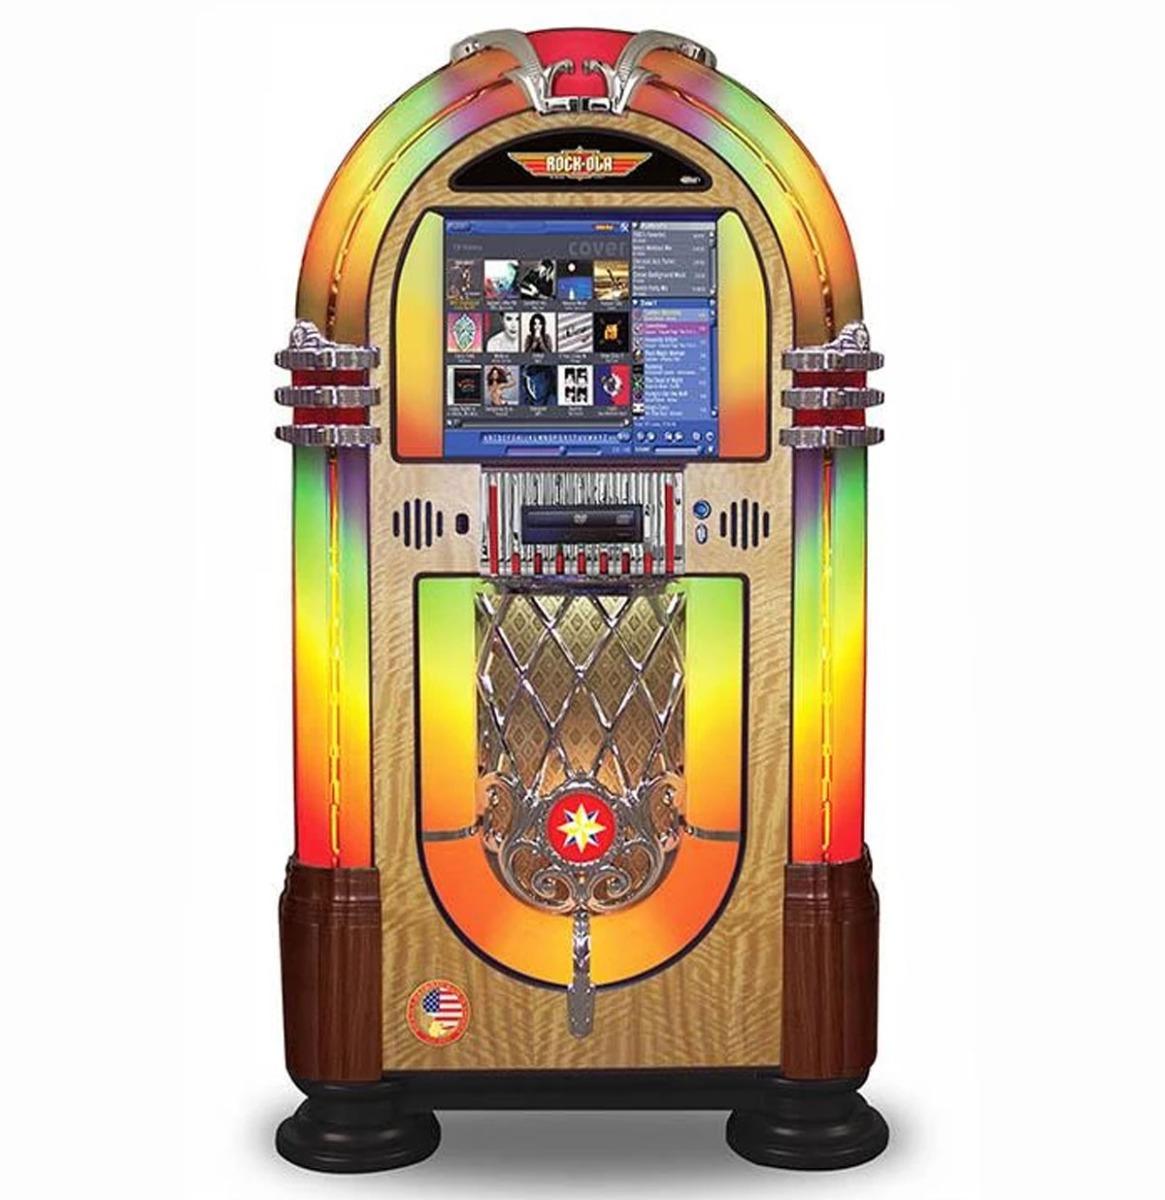 Rock-Ola Bubbler Digital Music Center Jukebox - Walnoot